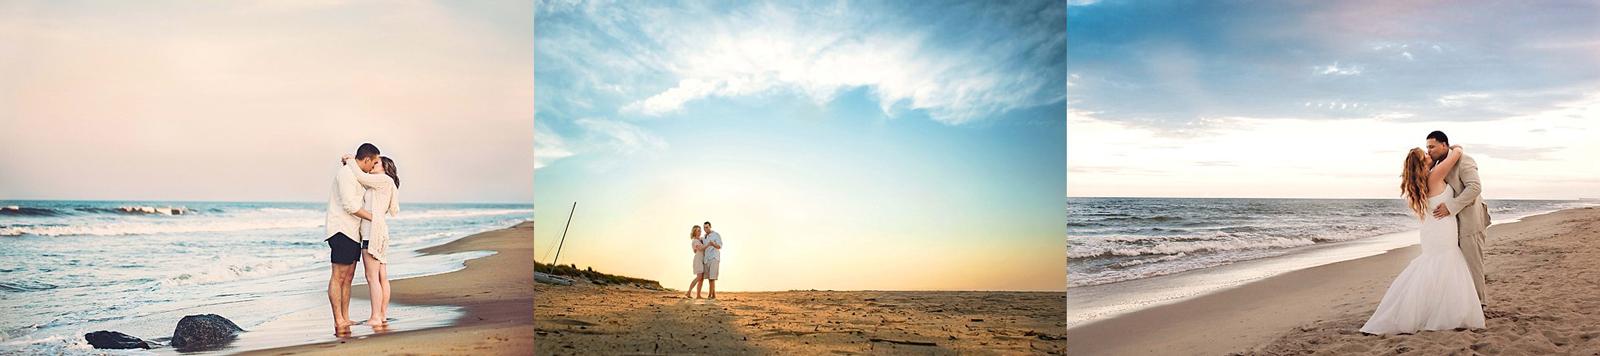 wedding-and-engagement-photographers-norfolk-virginia-beach-chesapeake-williamsburg-sandbridge-weddings